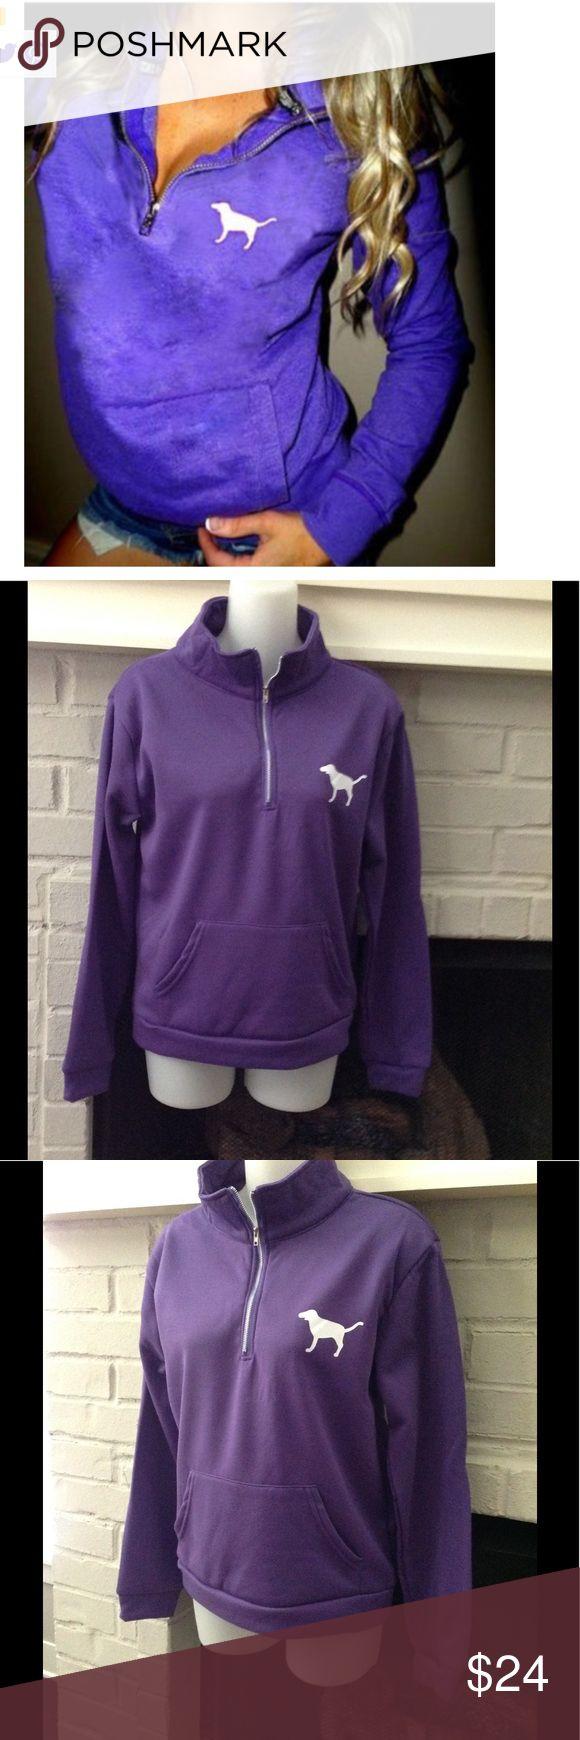 Women's top Purple hoodie. Great to throw on to walk your dog 🐶 Tops Sweatshirts & Hoodies